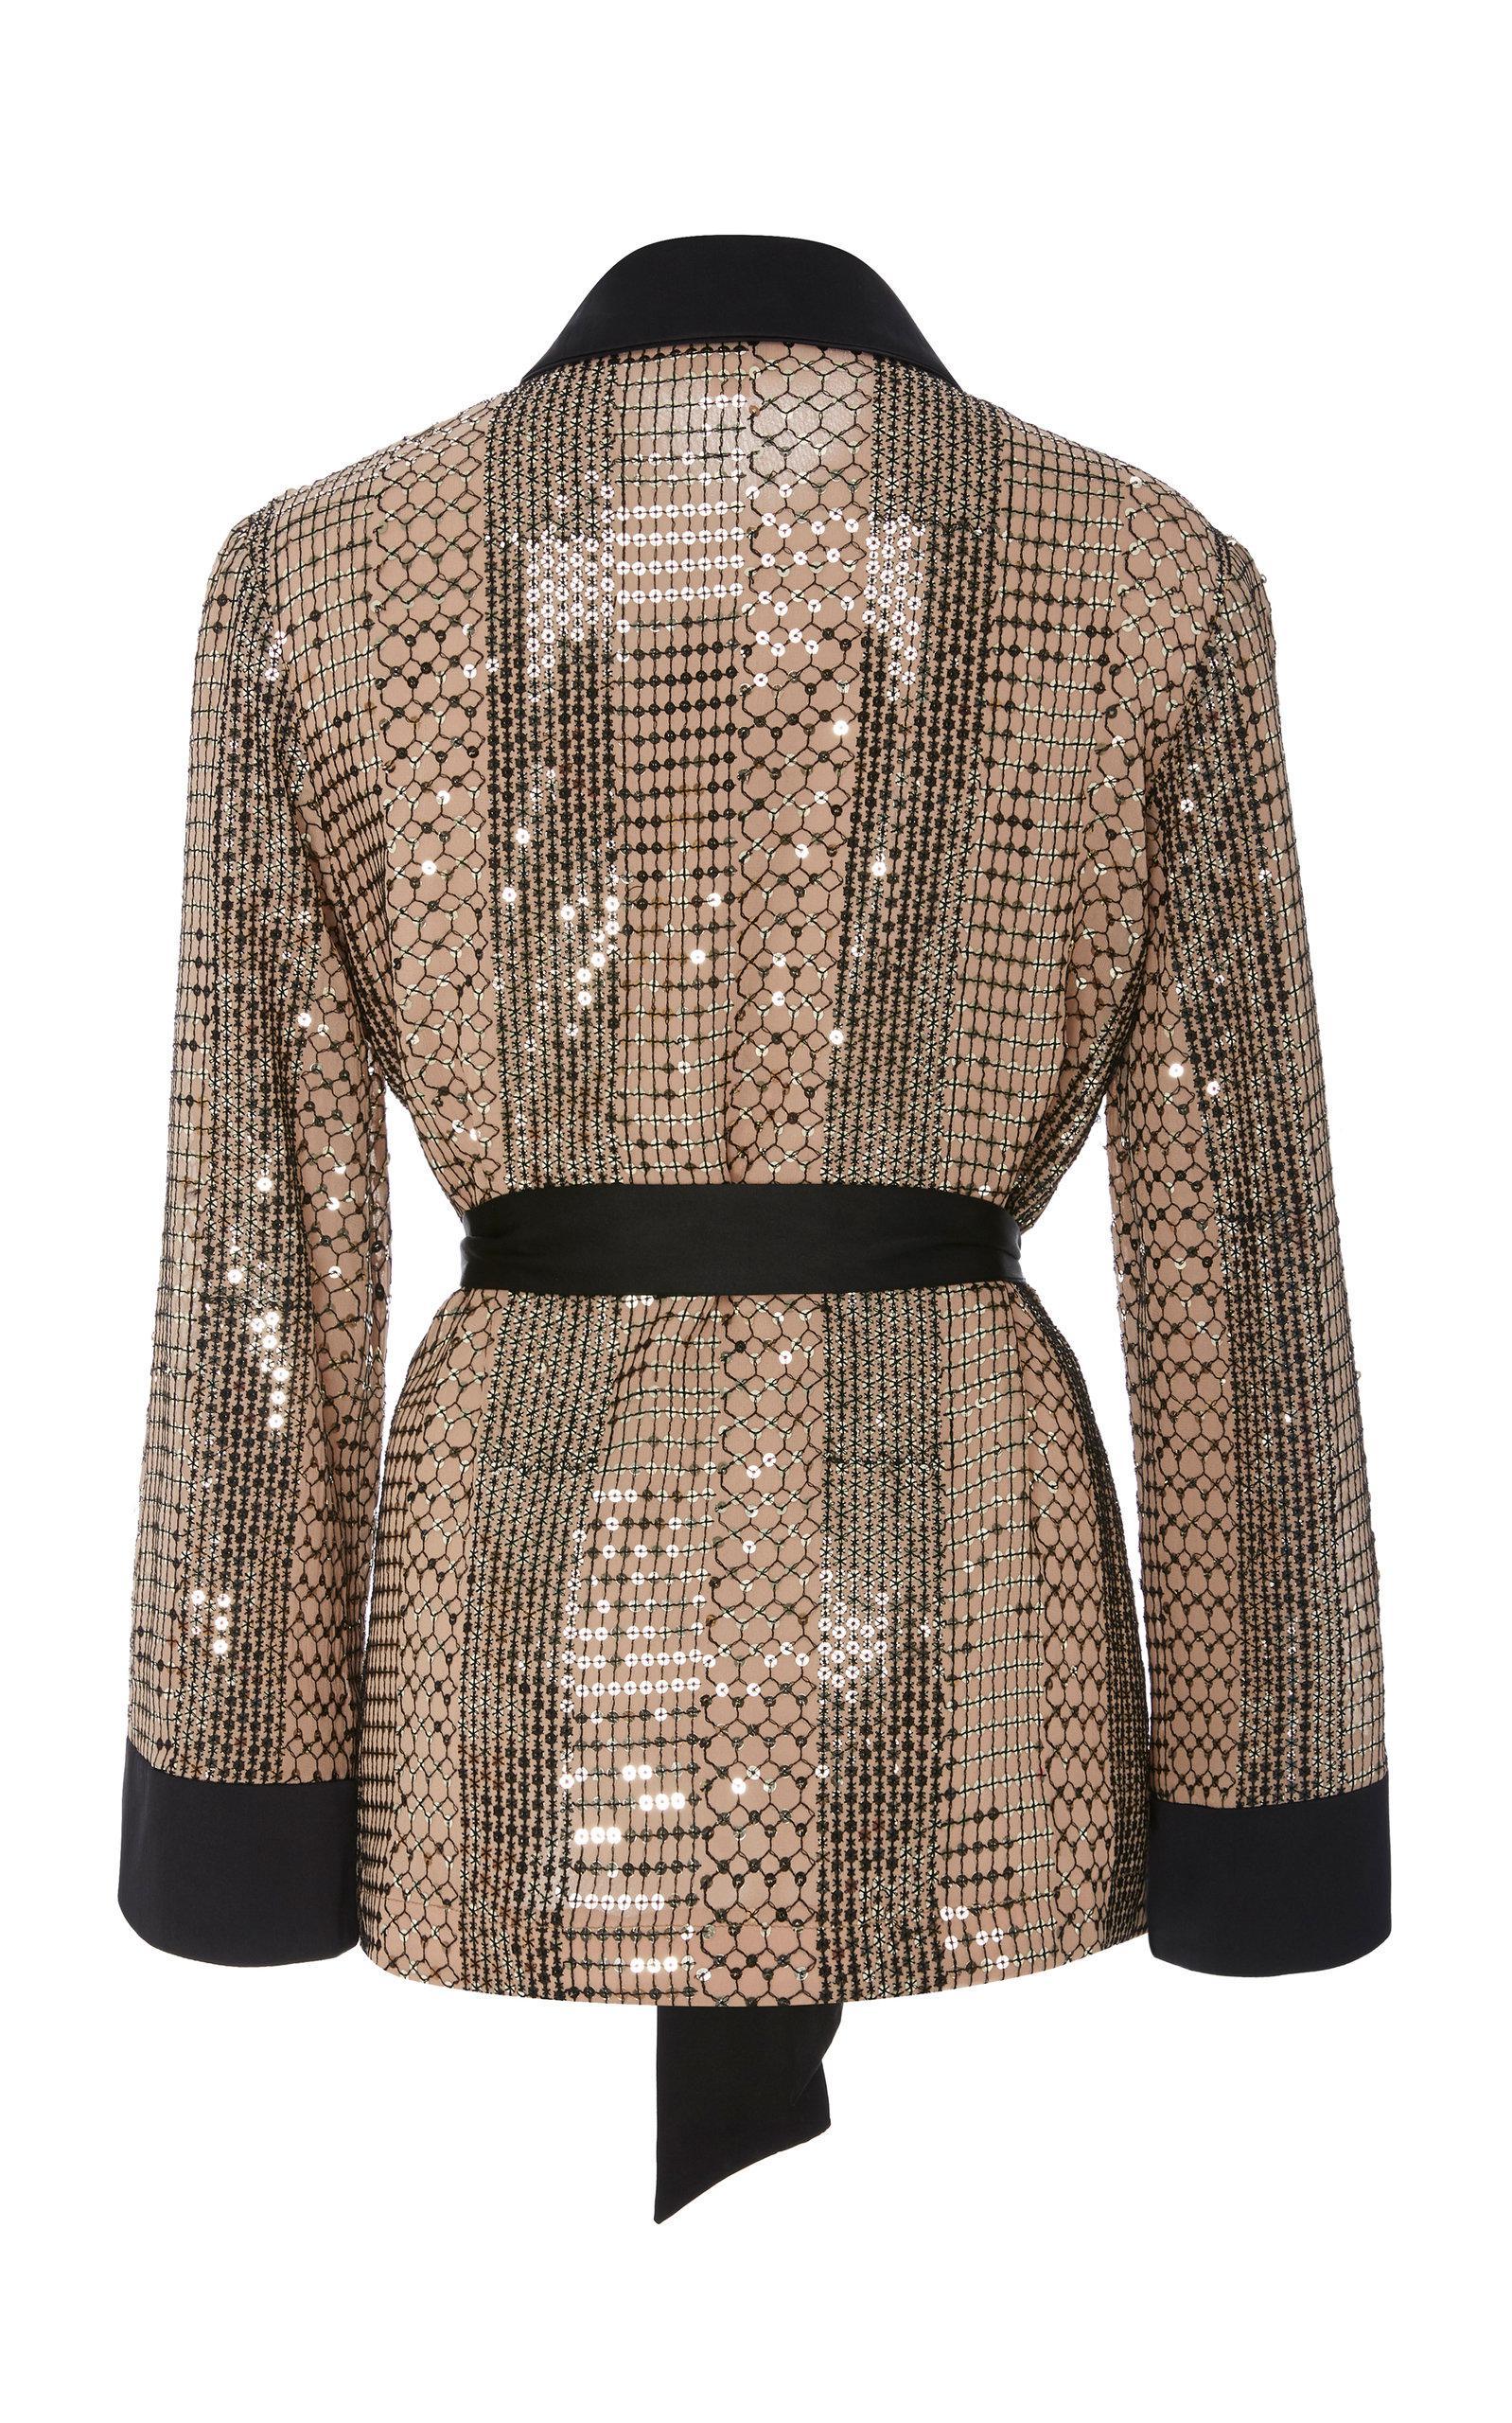 Temperley London Synthetic Platinum Shirt in Gold (Metallic)